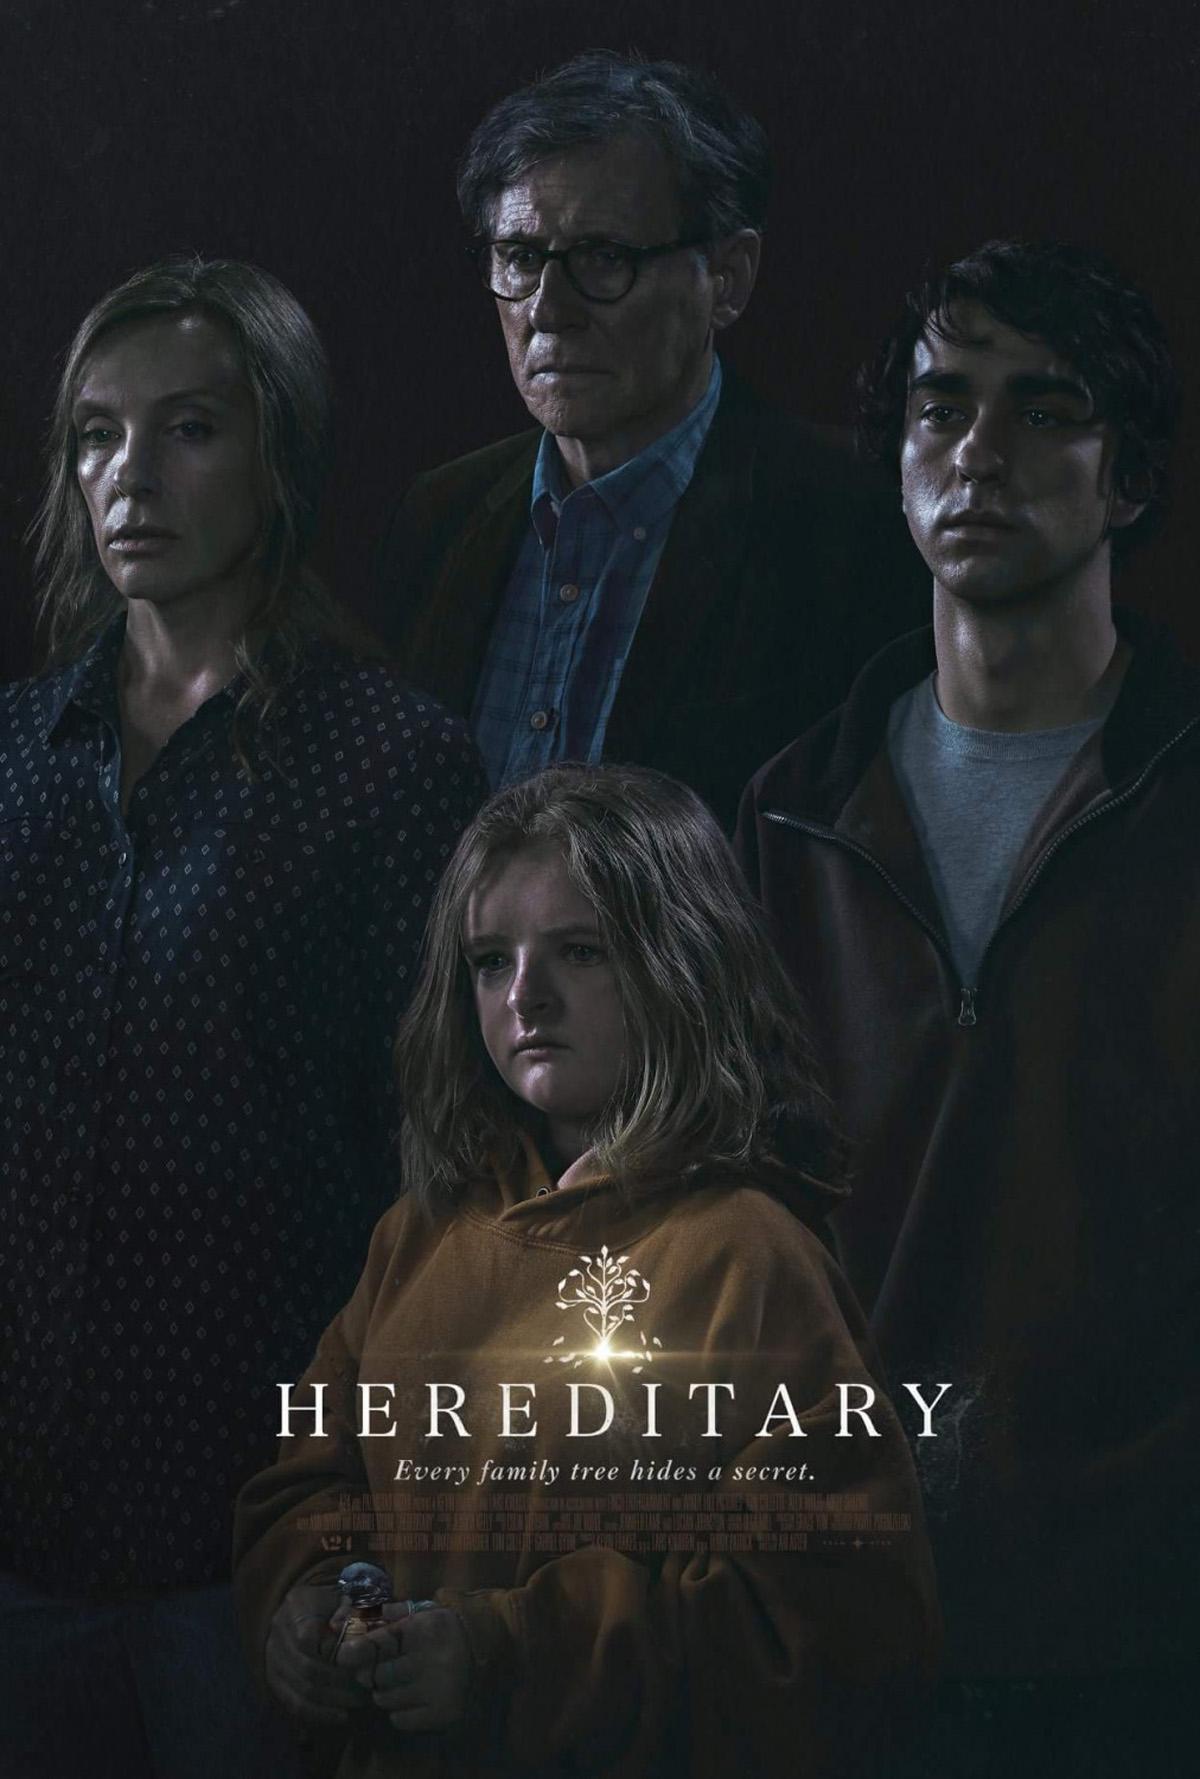 hereditary_ver2_xlg.jpg